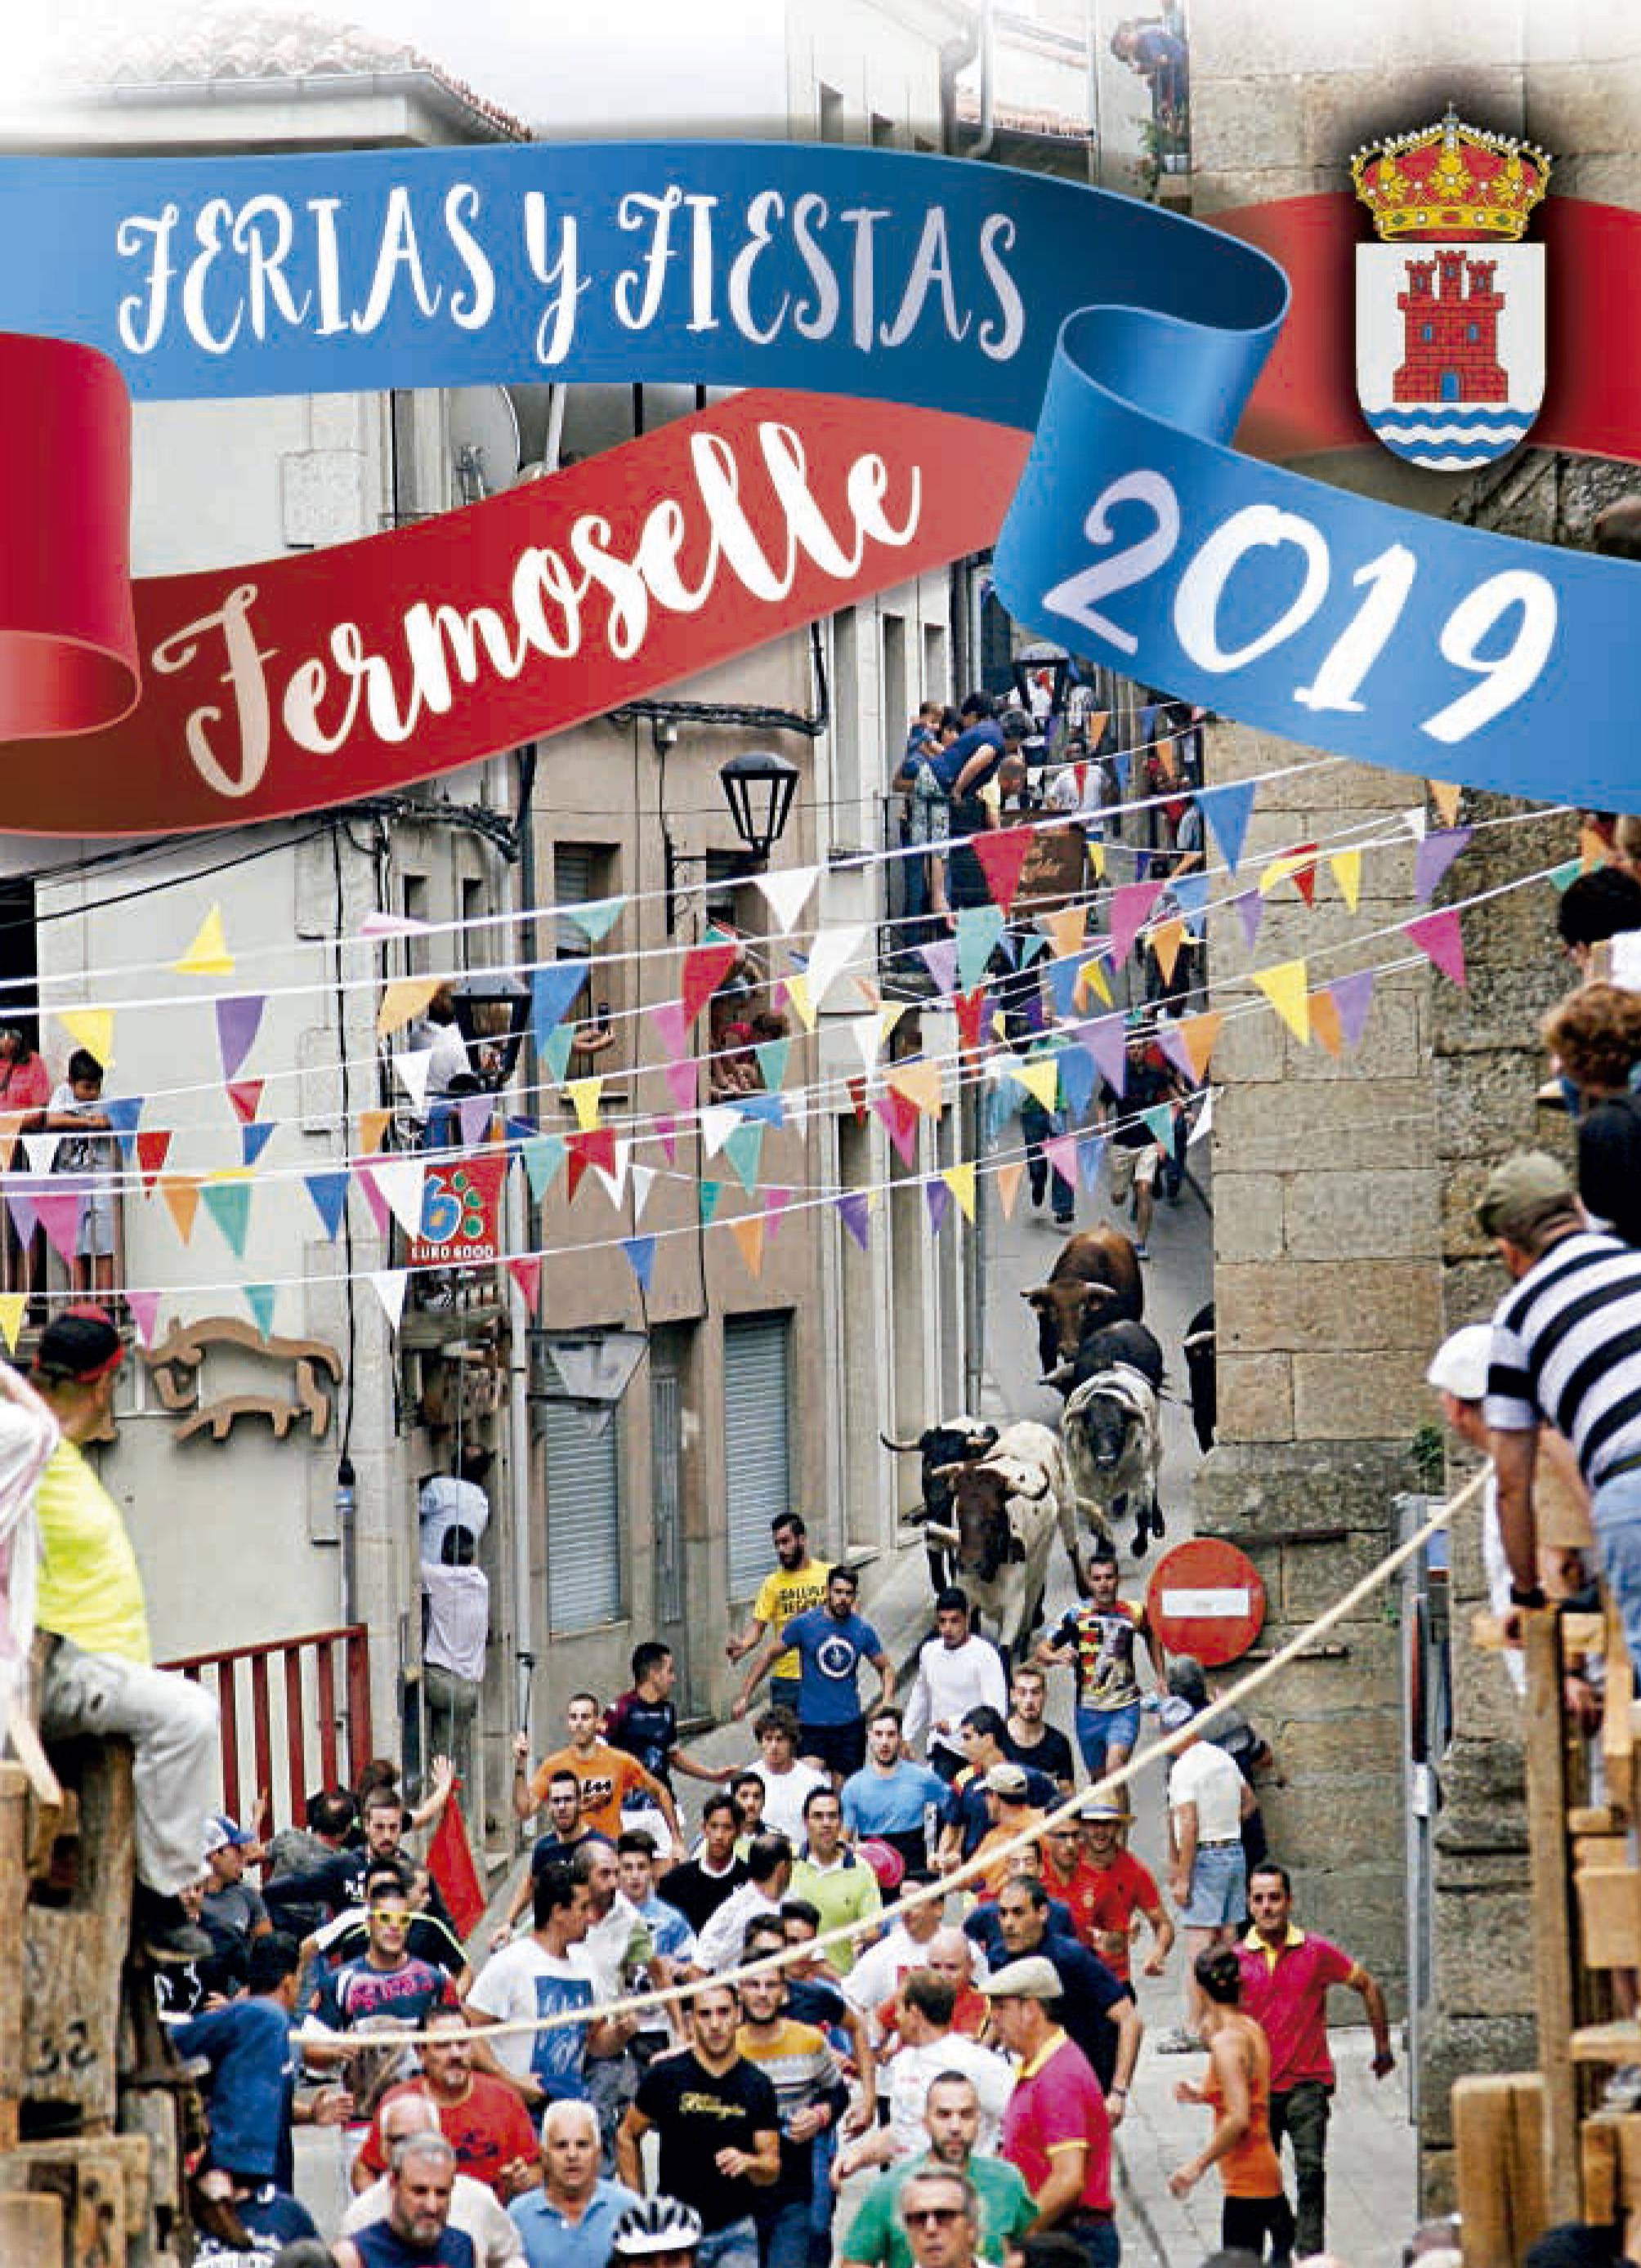 Programa de ferias y fiestas 2019 - Fermoselle (Zamora) 1